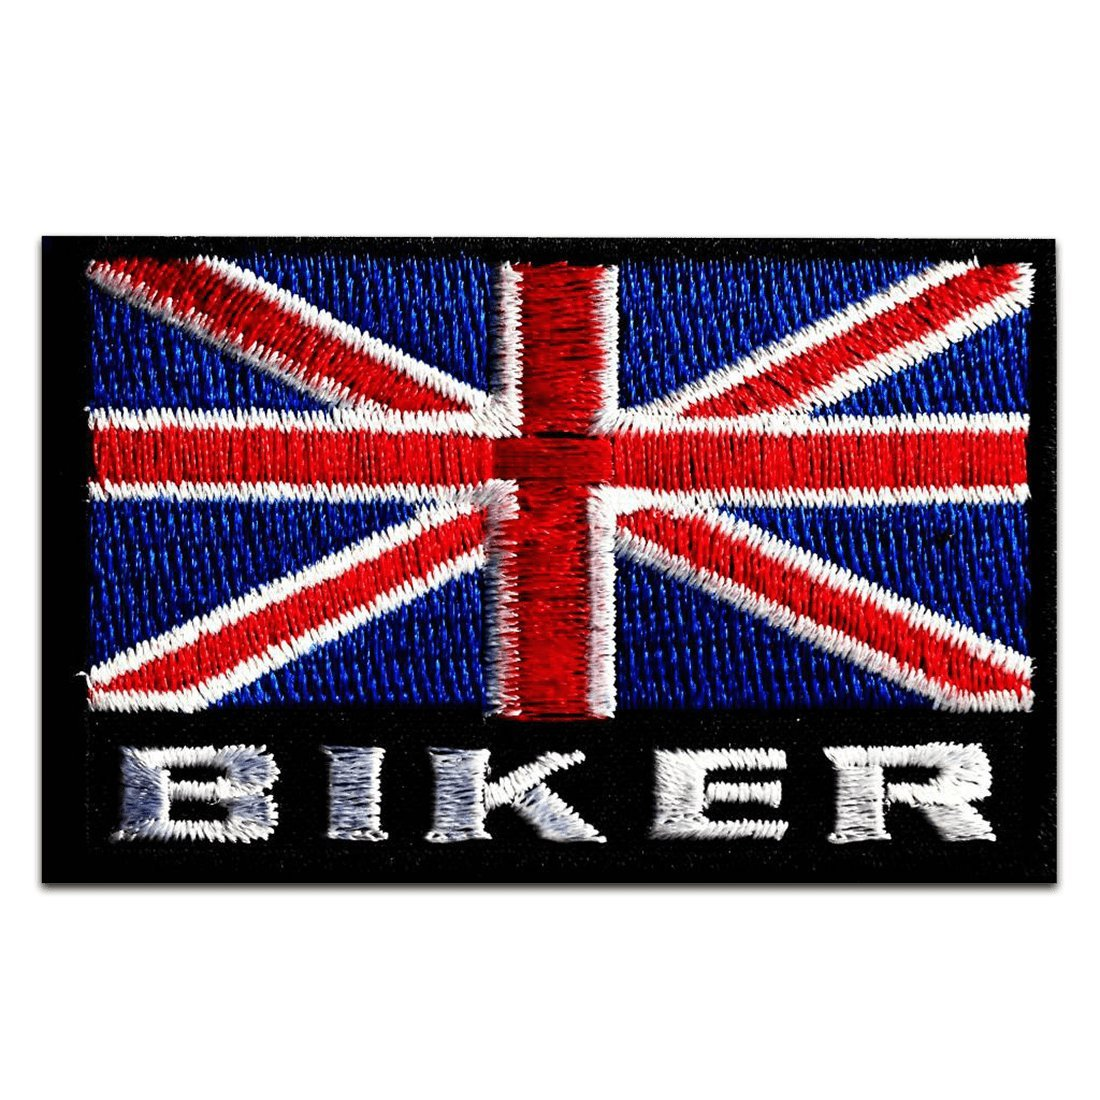 Britain UK England Flagge Fahne Aufnäher // Bügelbild Gt 6 x 7cm blau